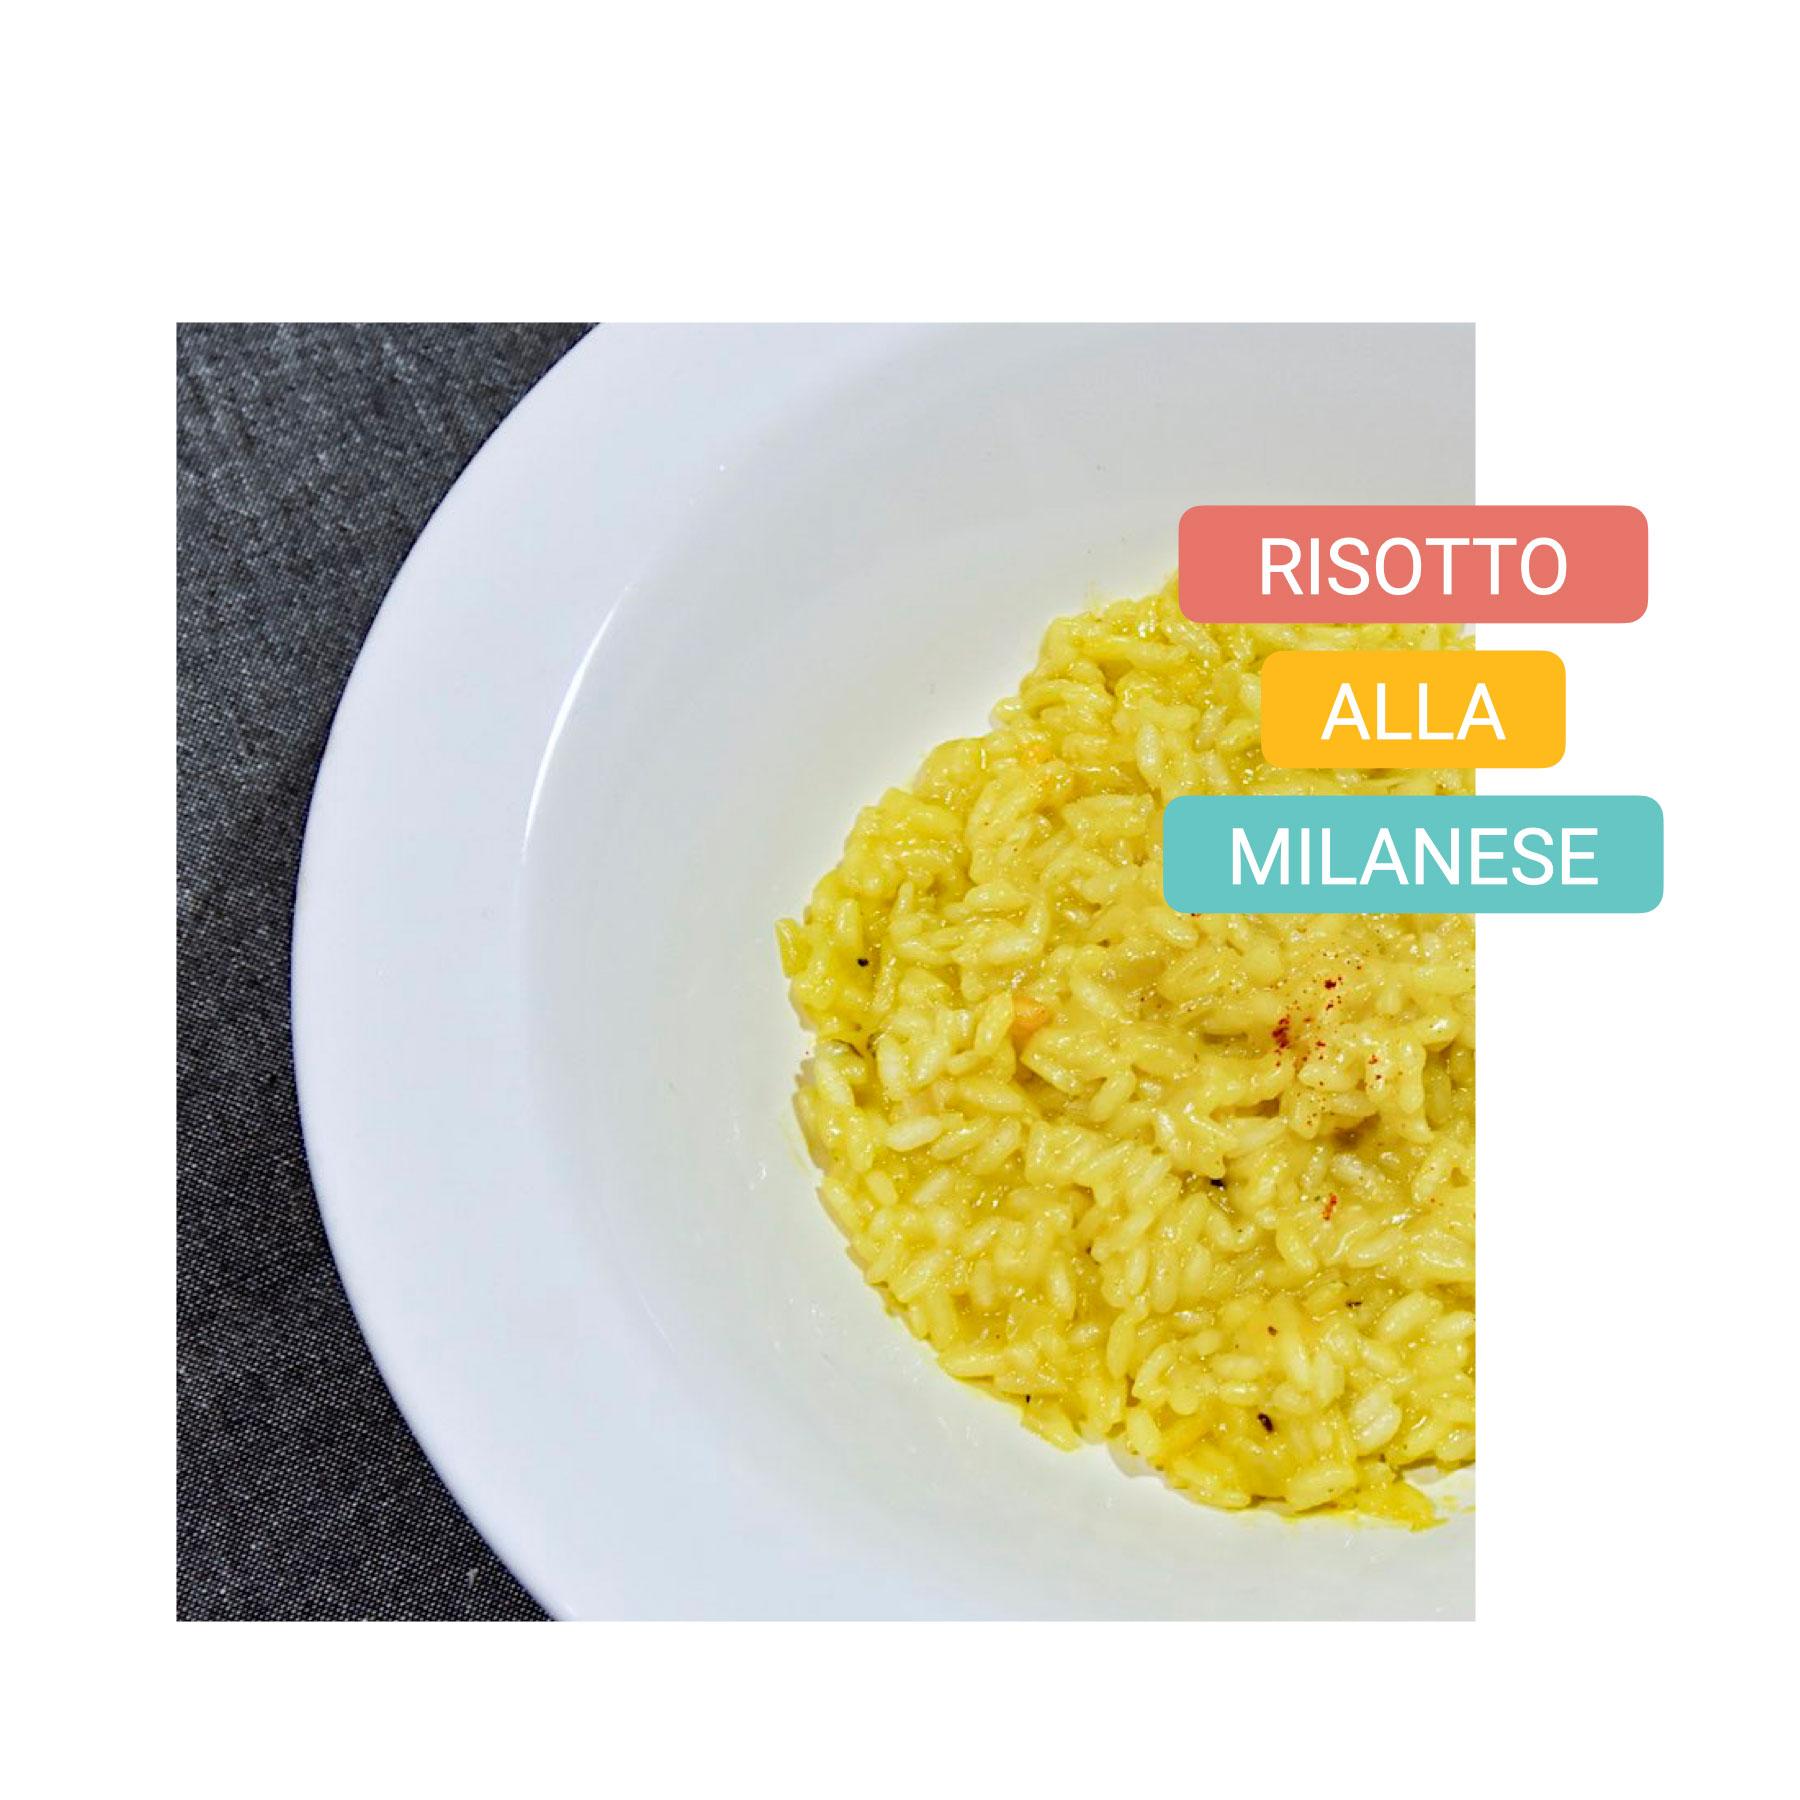 Typische gerechten uit Milaan fietstours - panettone - risotto alla milanese 2